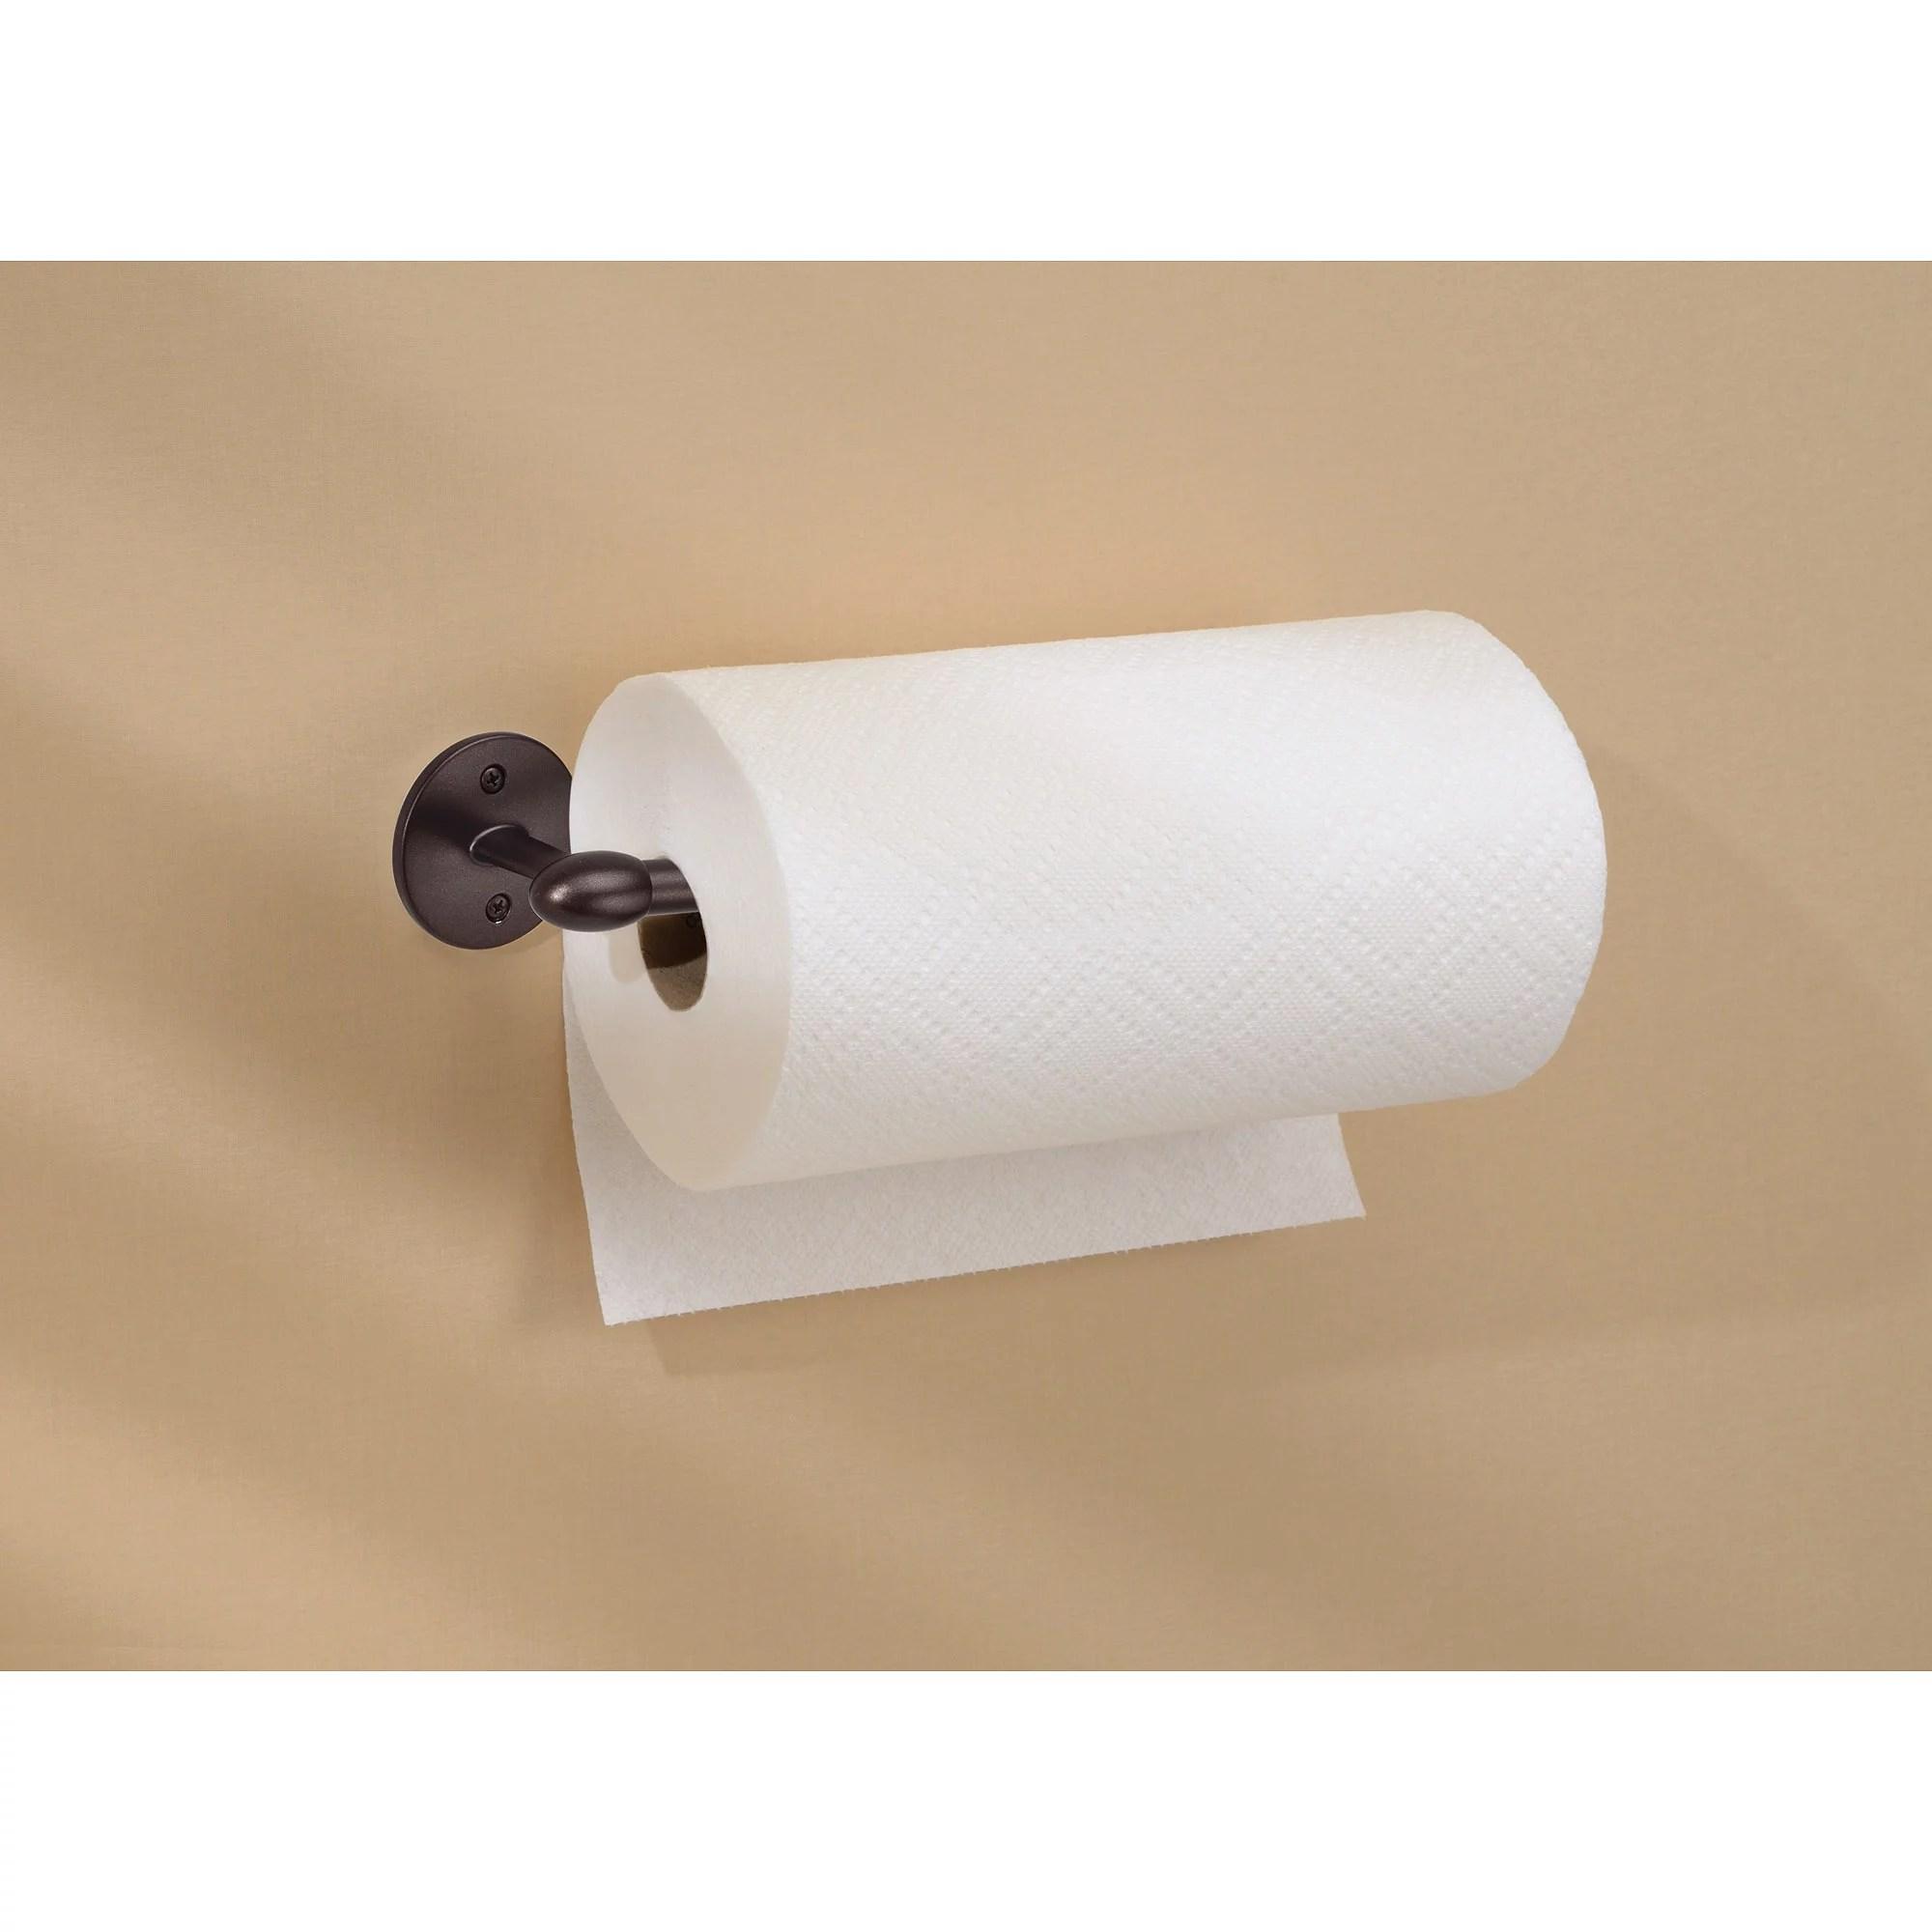 kitchen paper towel holder island table combo interdesign orbinni wall mounted walmart com